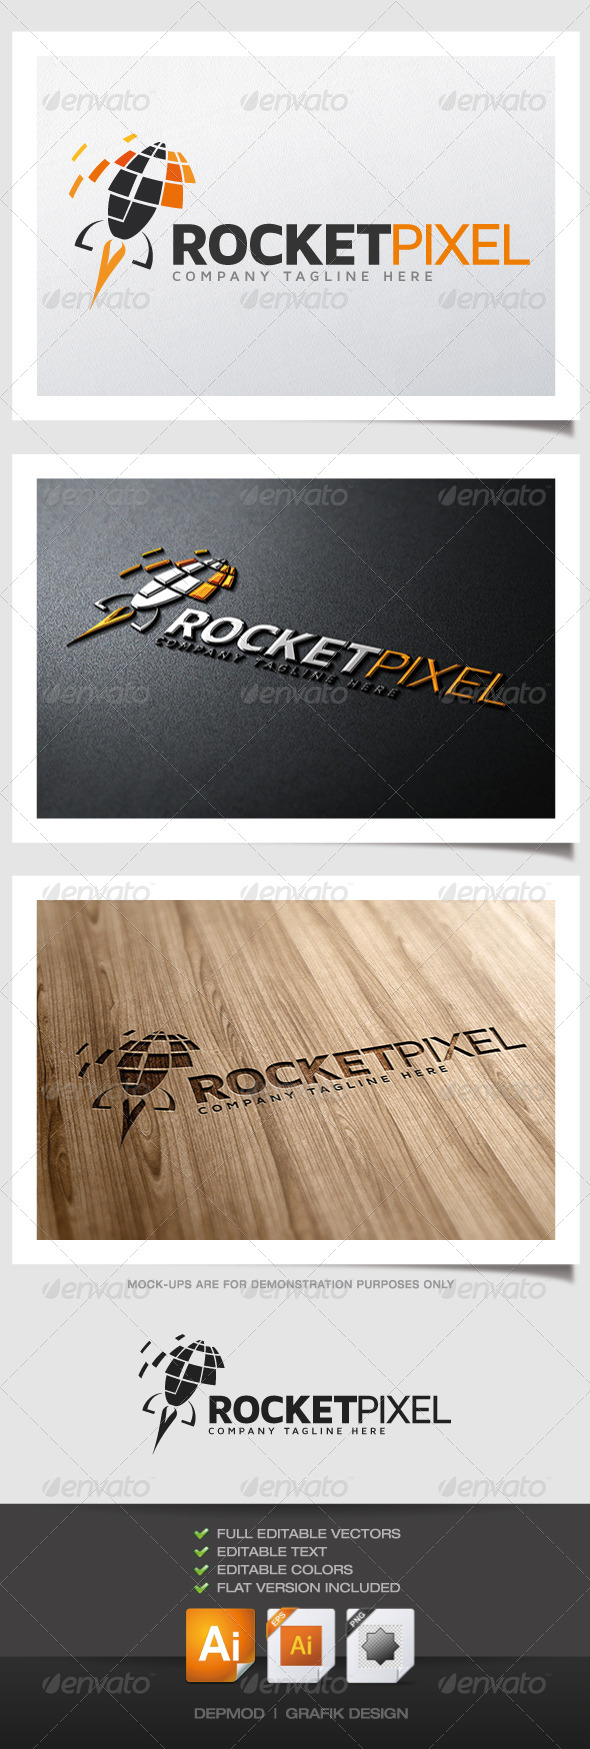 GraphicRiver Rocket Pixel Logo 4769219